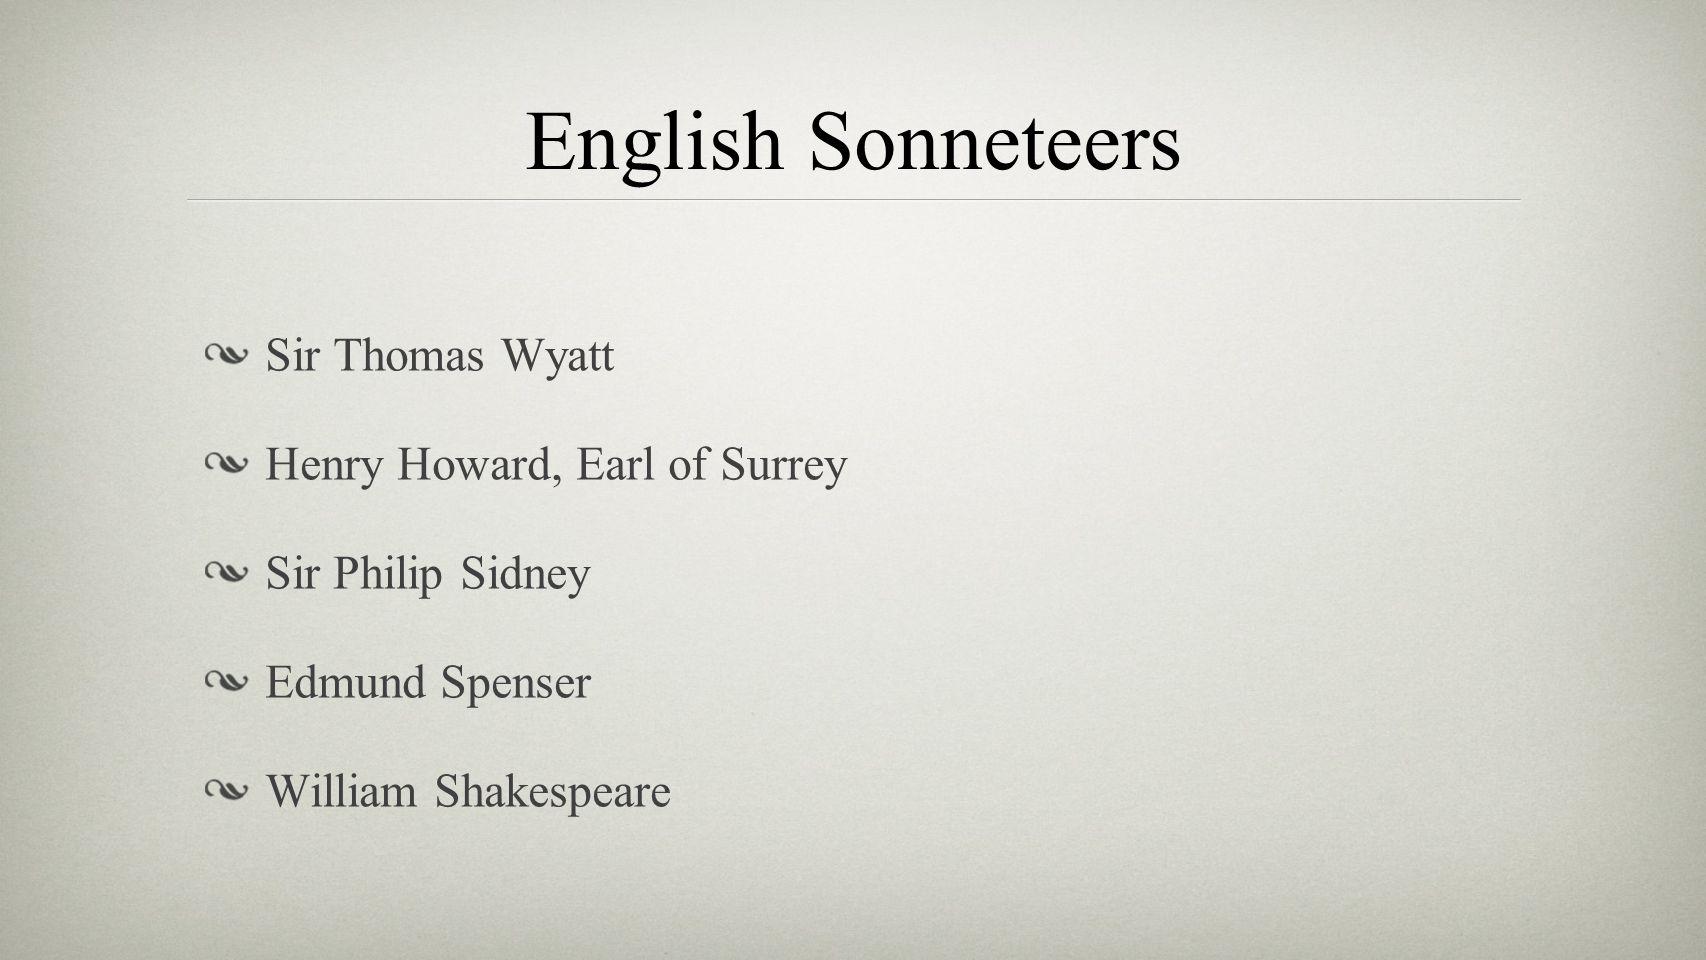 English Sonneteers Sir Thomas Wyatt Henry Howard, Earl of Surrey Sir Philip Sidney Edmund Spenser William Shakespeare